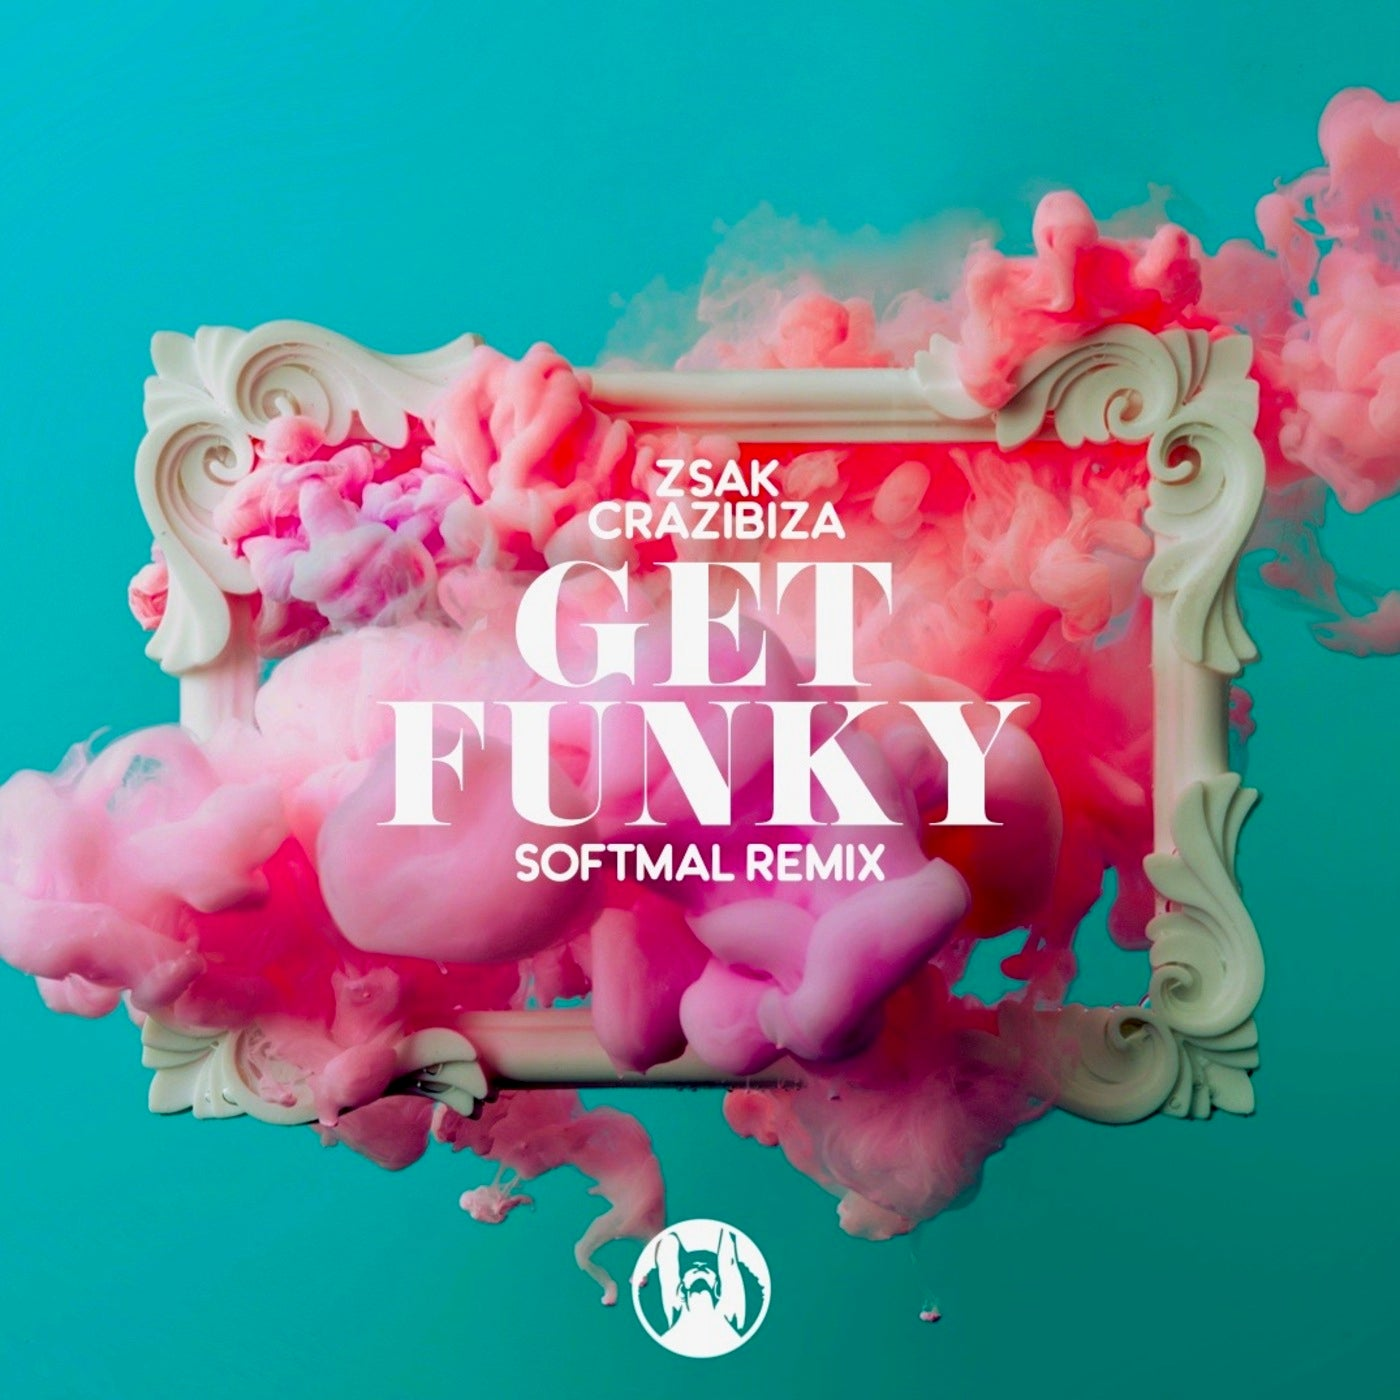 Get Funky (Softmal Remix)